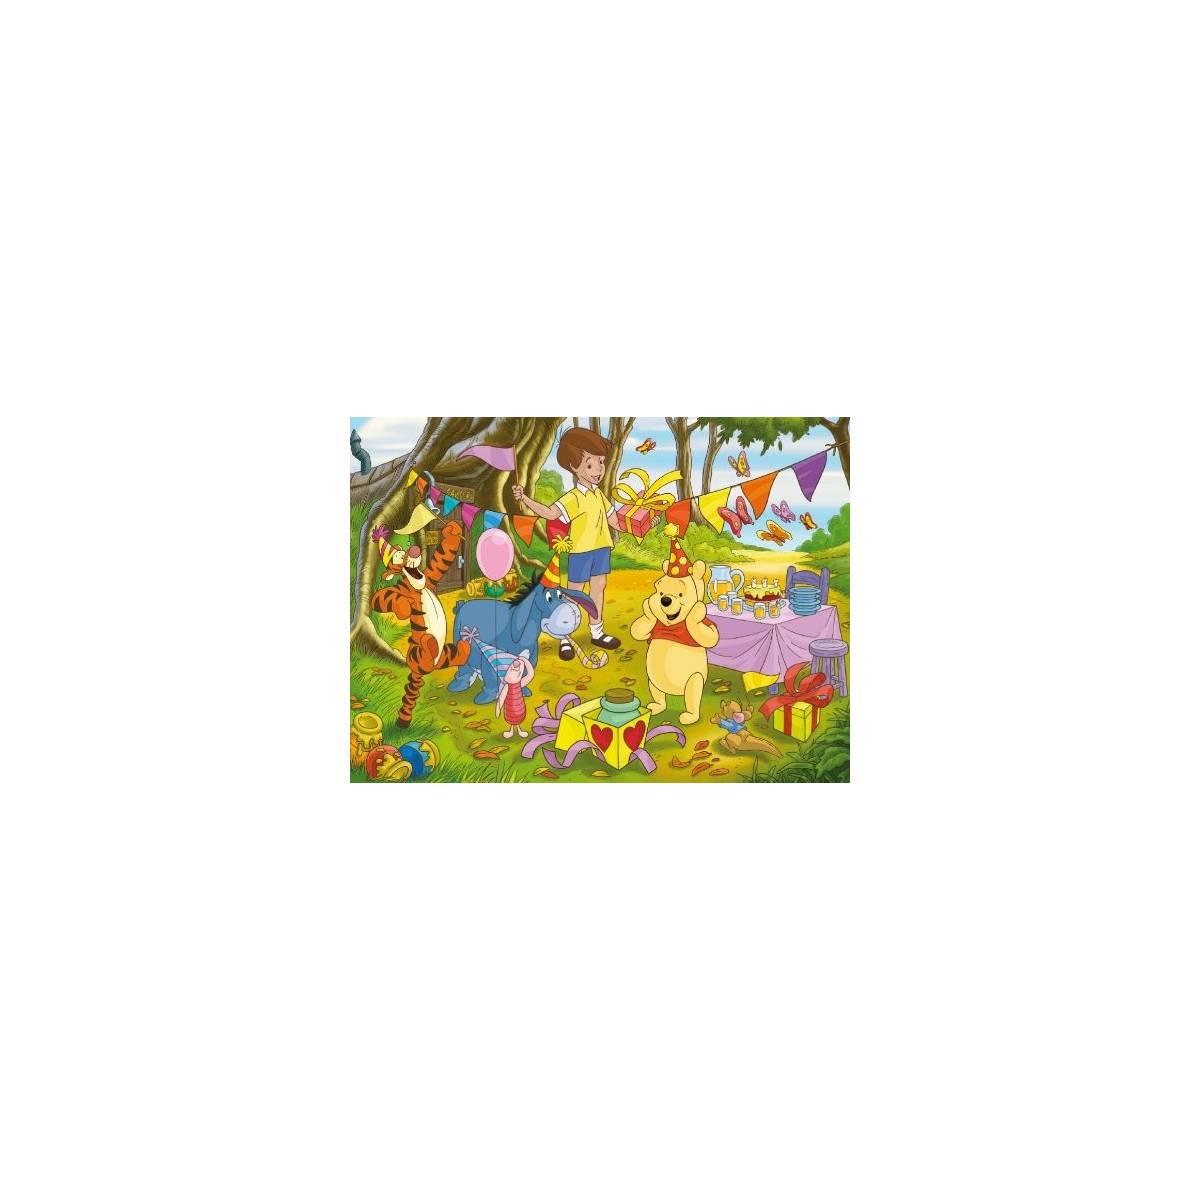 Clementoni - Puzzle 100 pièces - Winnie l'ourson - Happy Birthday